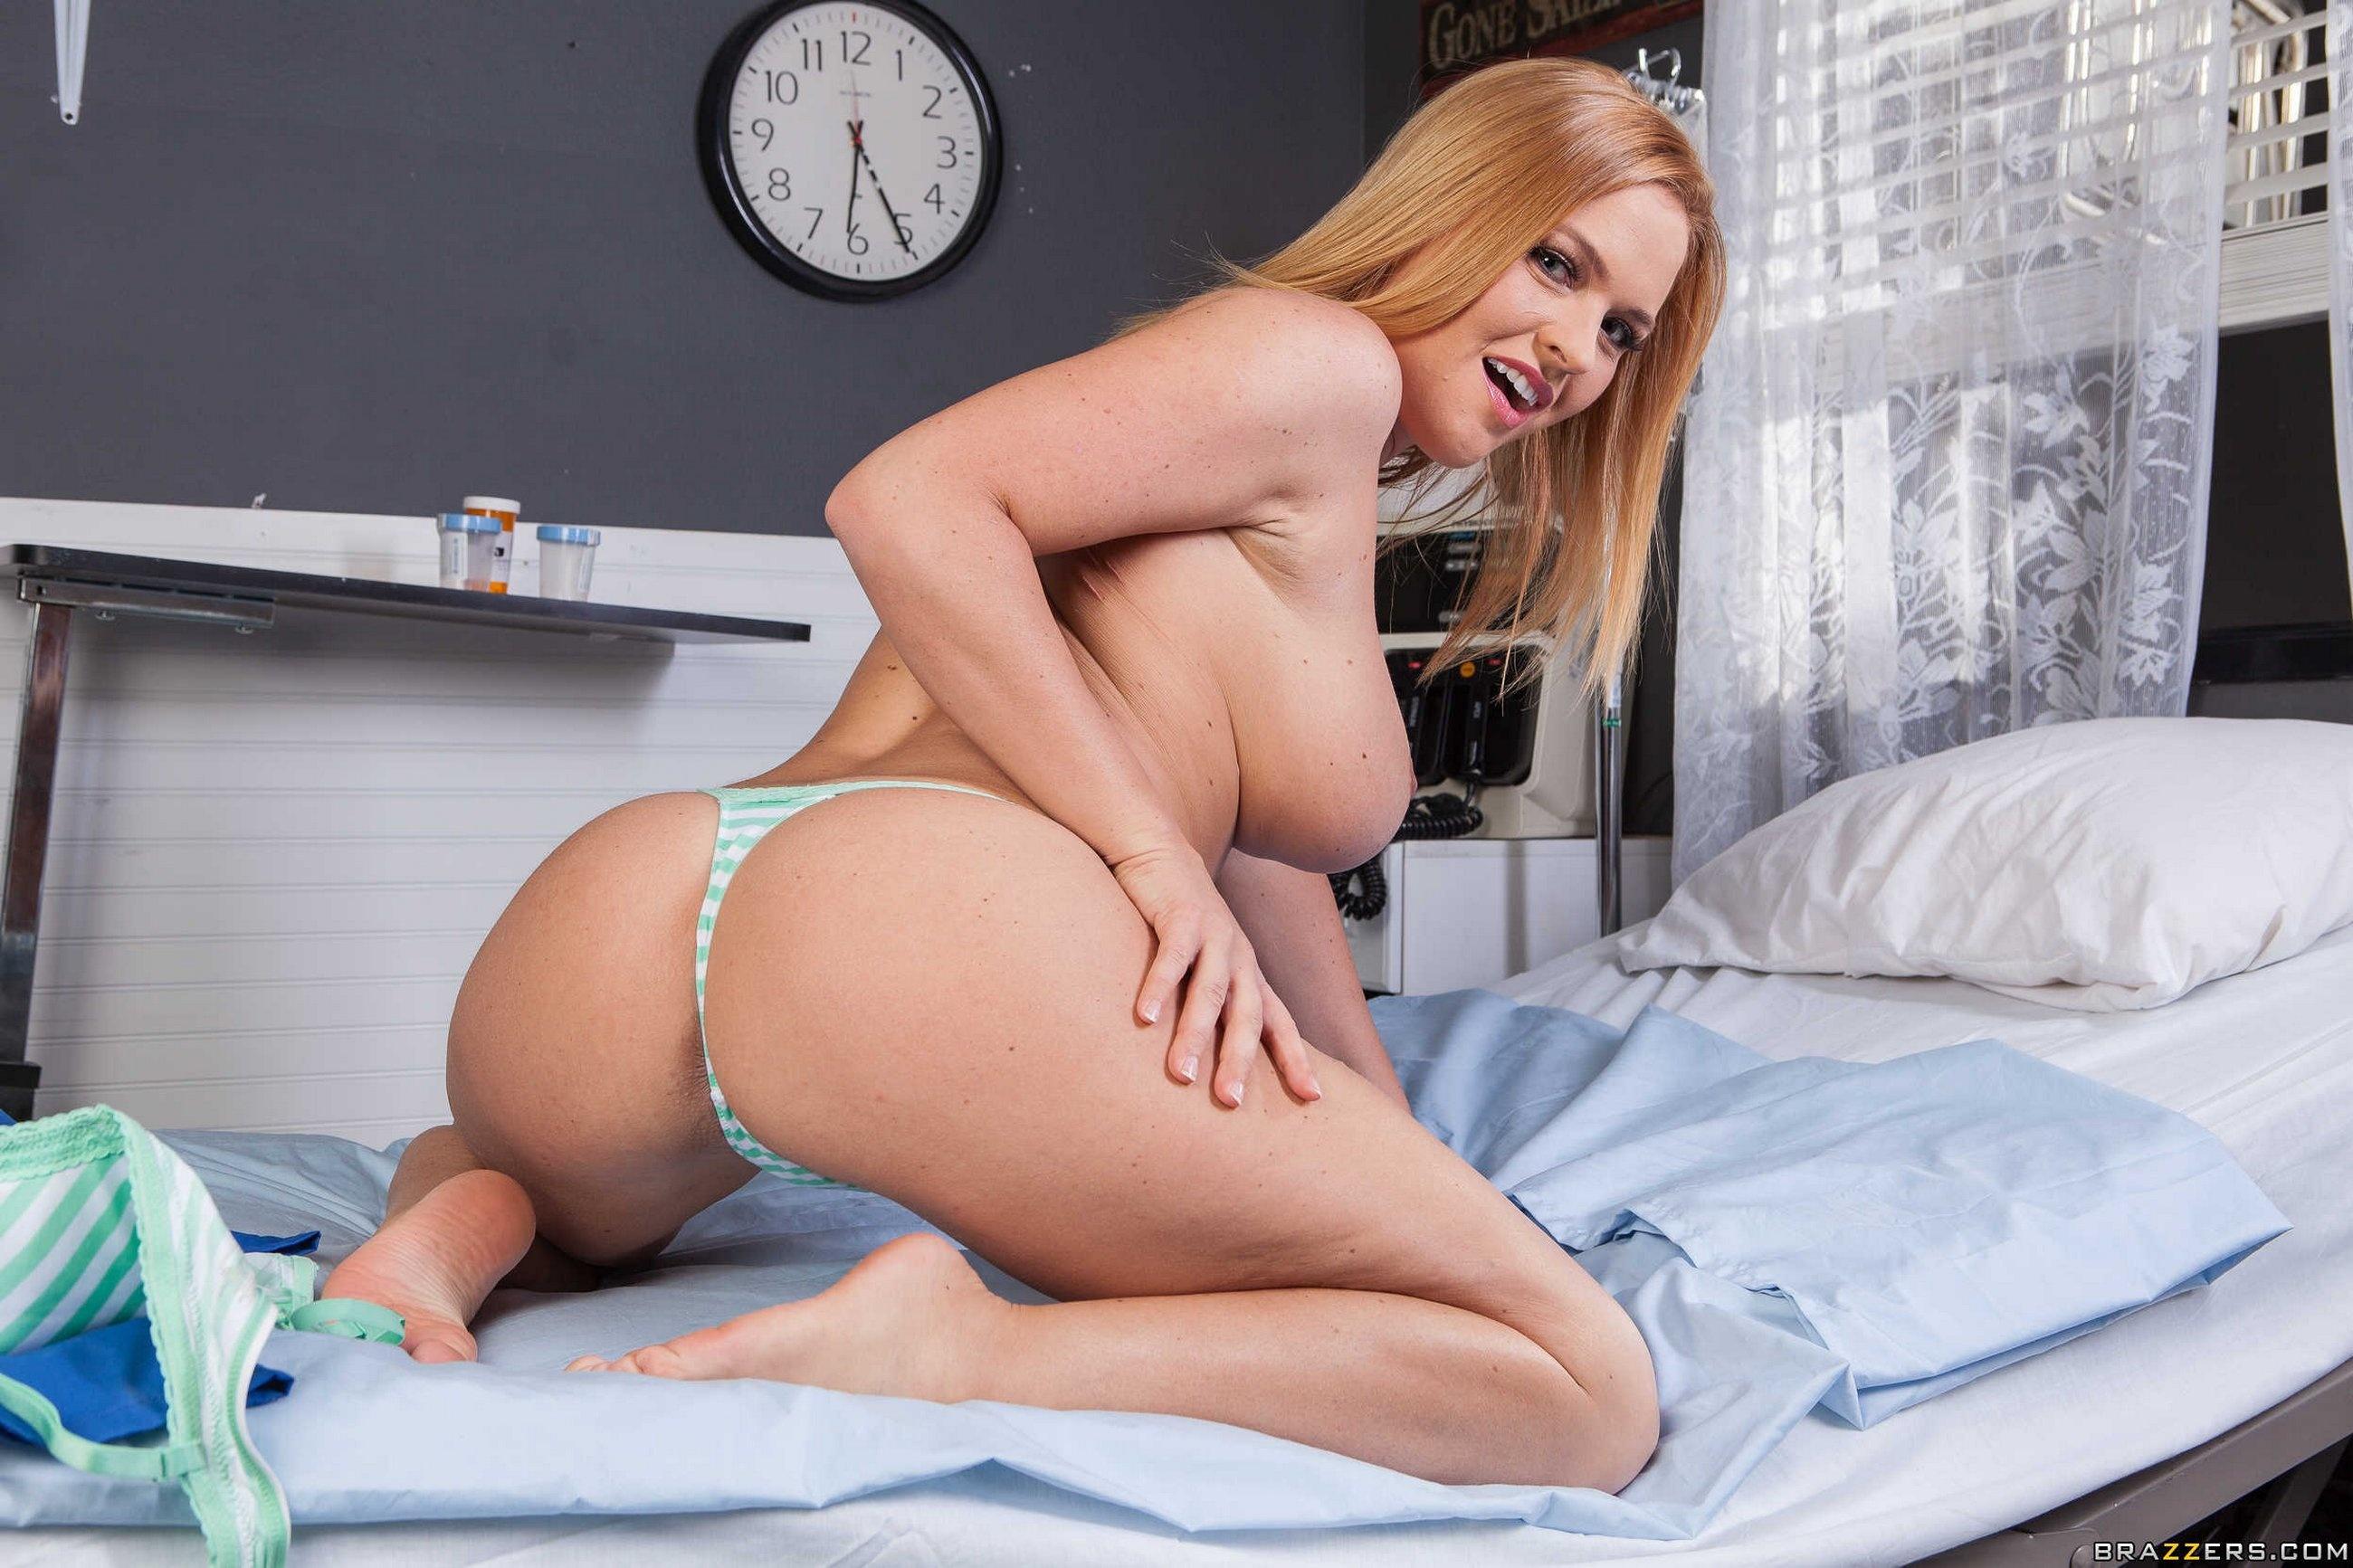 Sexy nurse ass pics